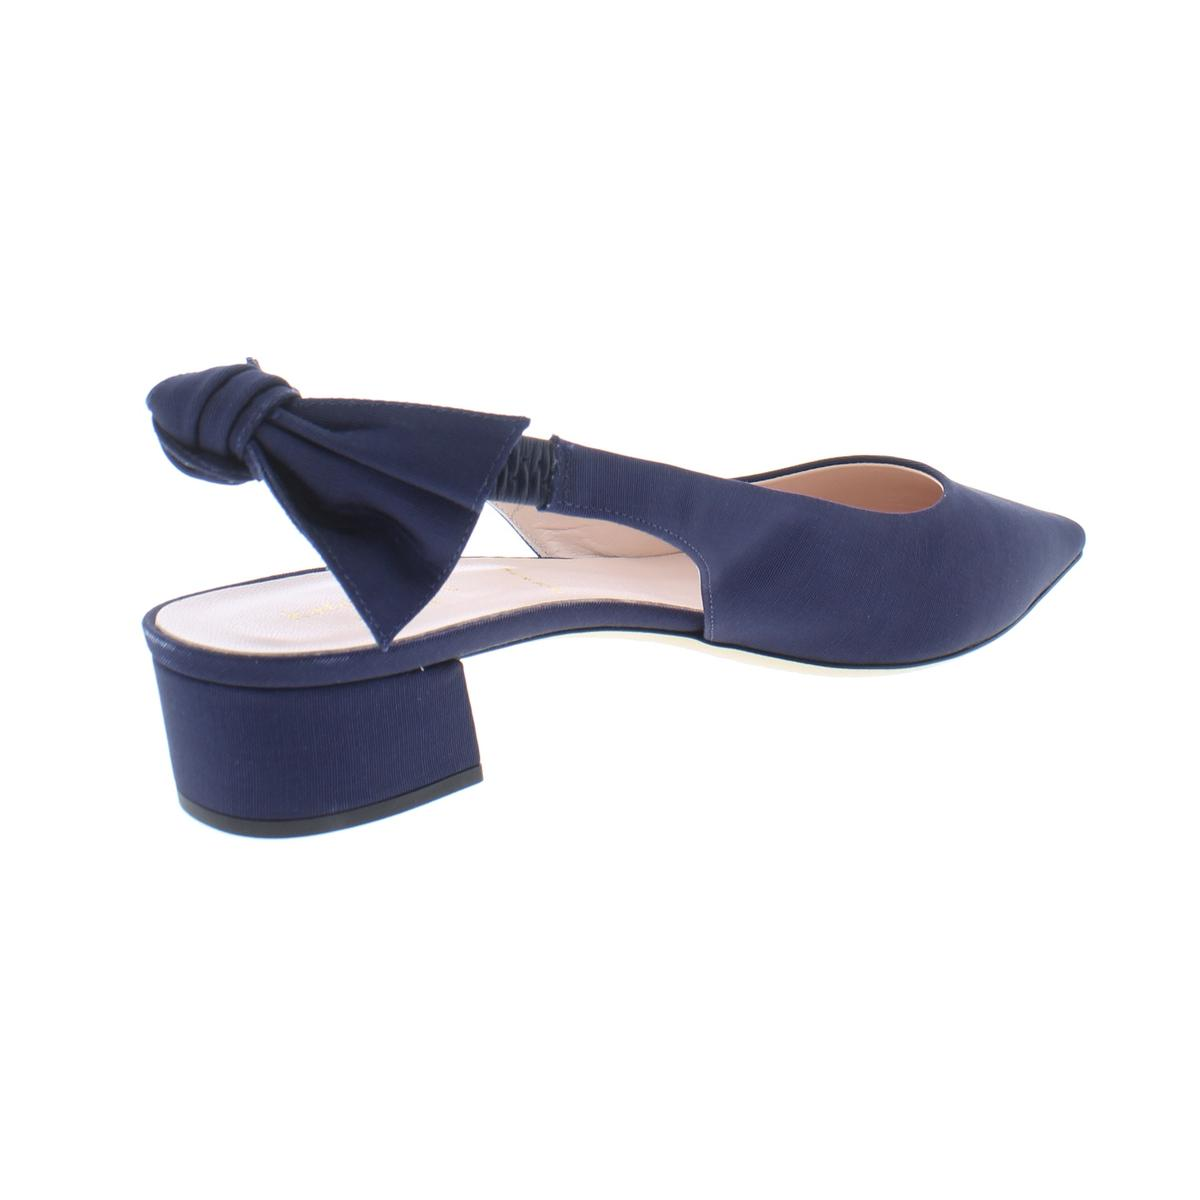 Kate-Spade-Womens-Lucia-Slingback-Pointed-Toe-Dress-Pumps-Evening-BHFO-9770 thumbnail 4